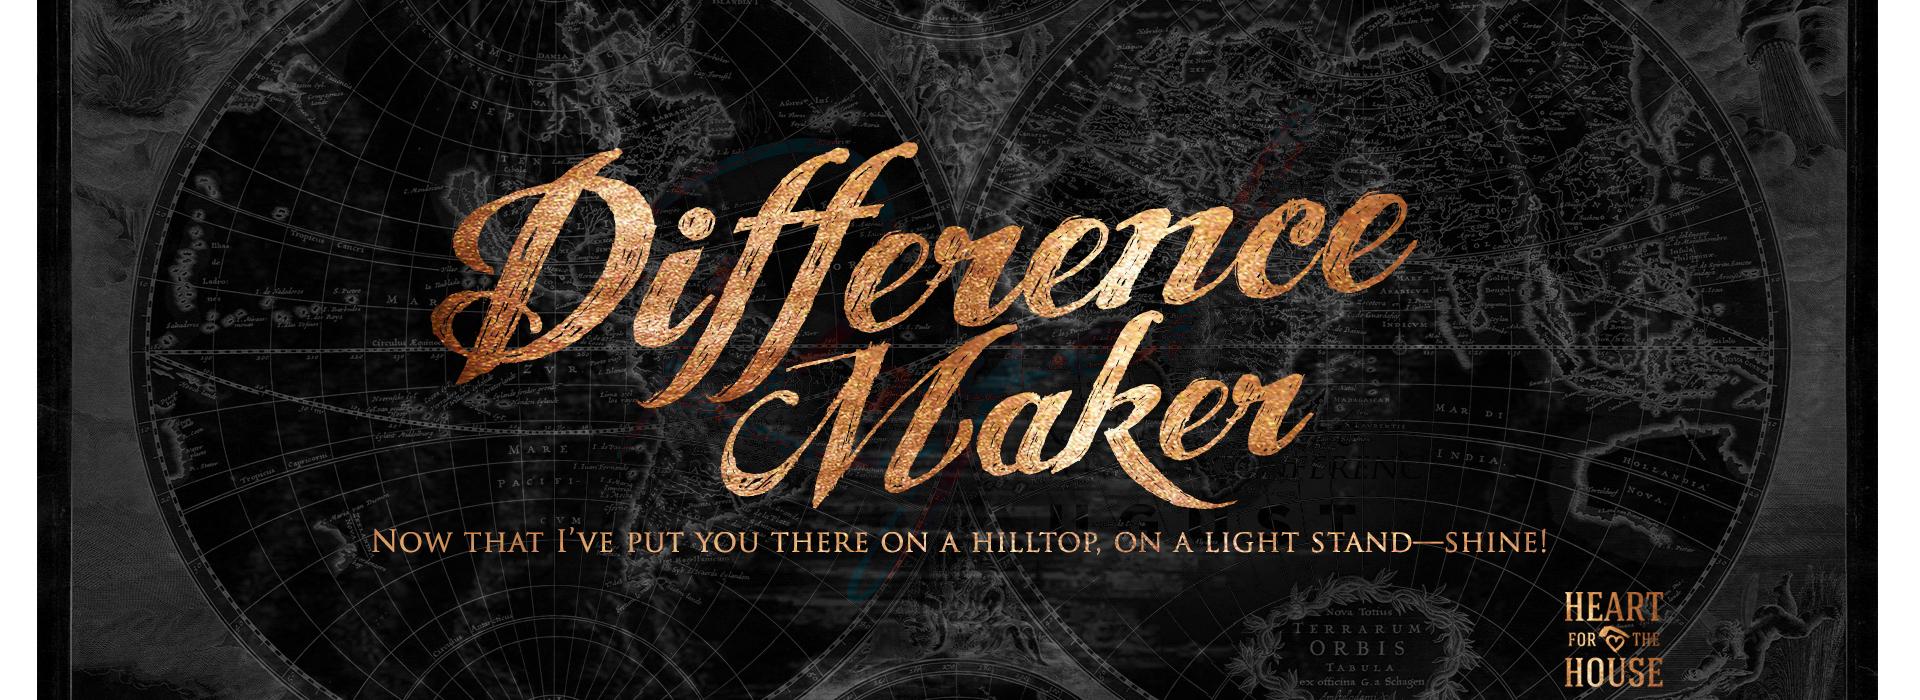 DifferenceMaker_WebBanner-1